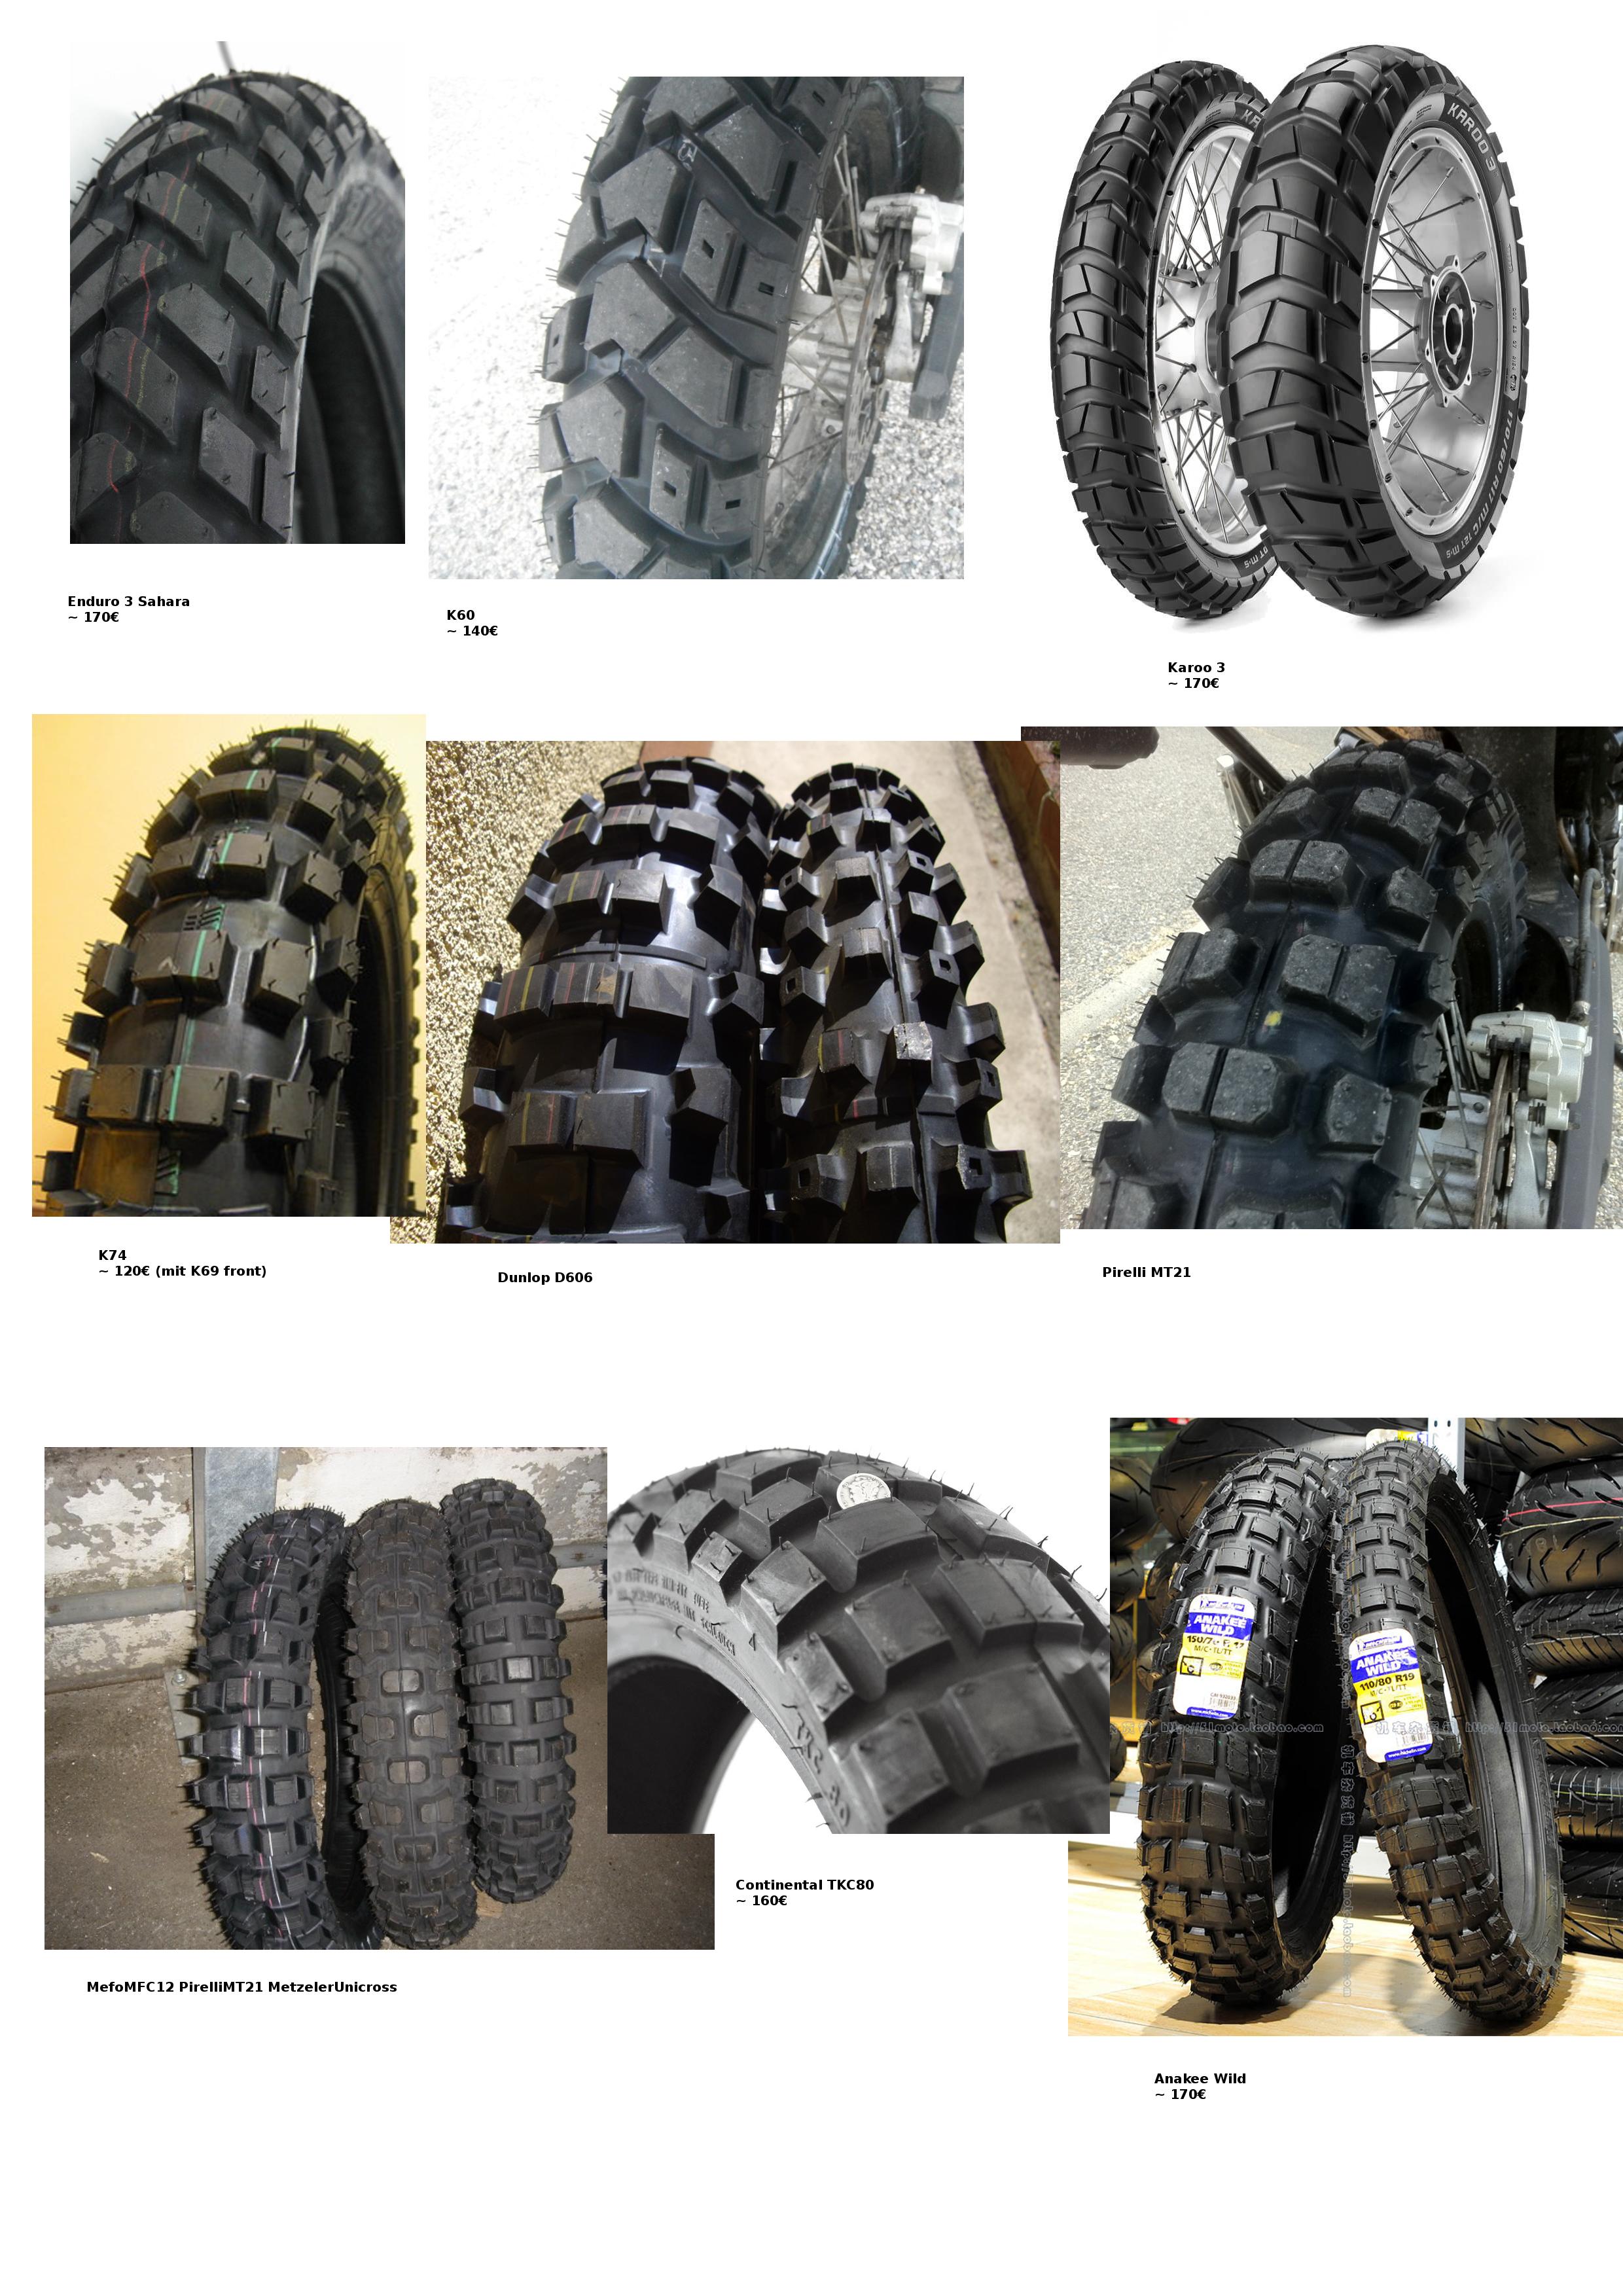 https://web6.codeprobe.de/level_a/allow/TA/tires.png